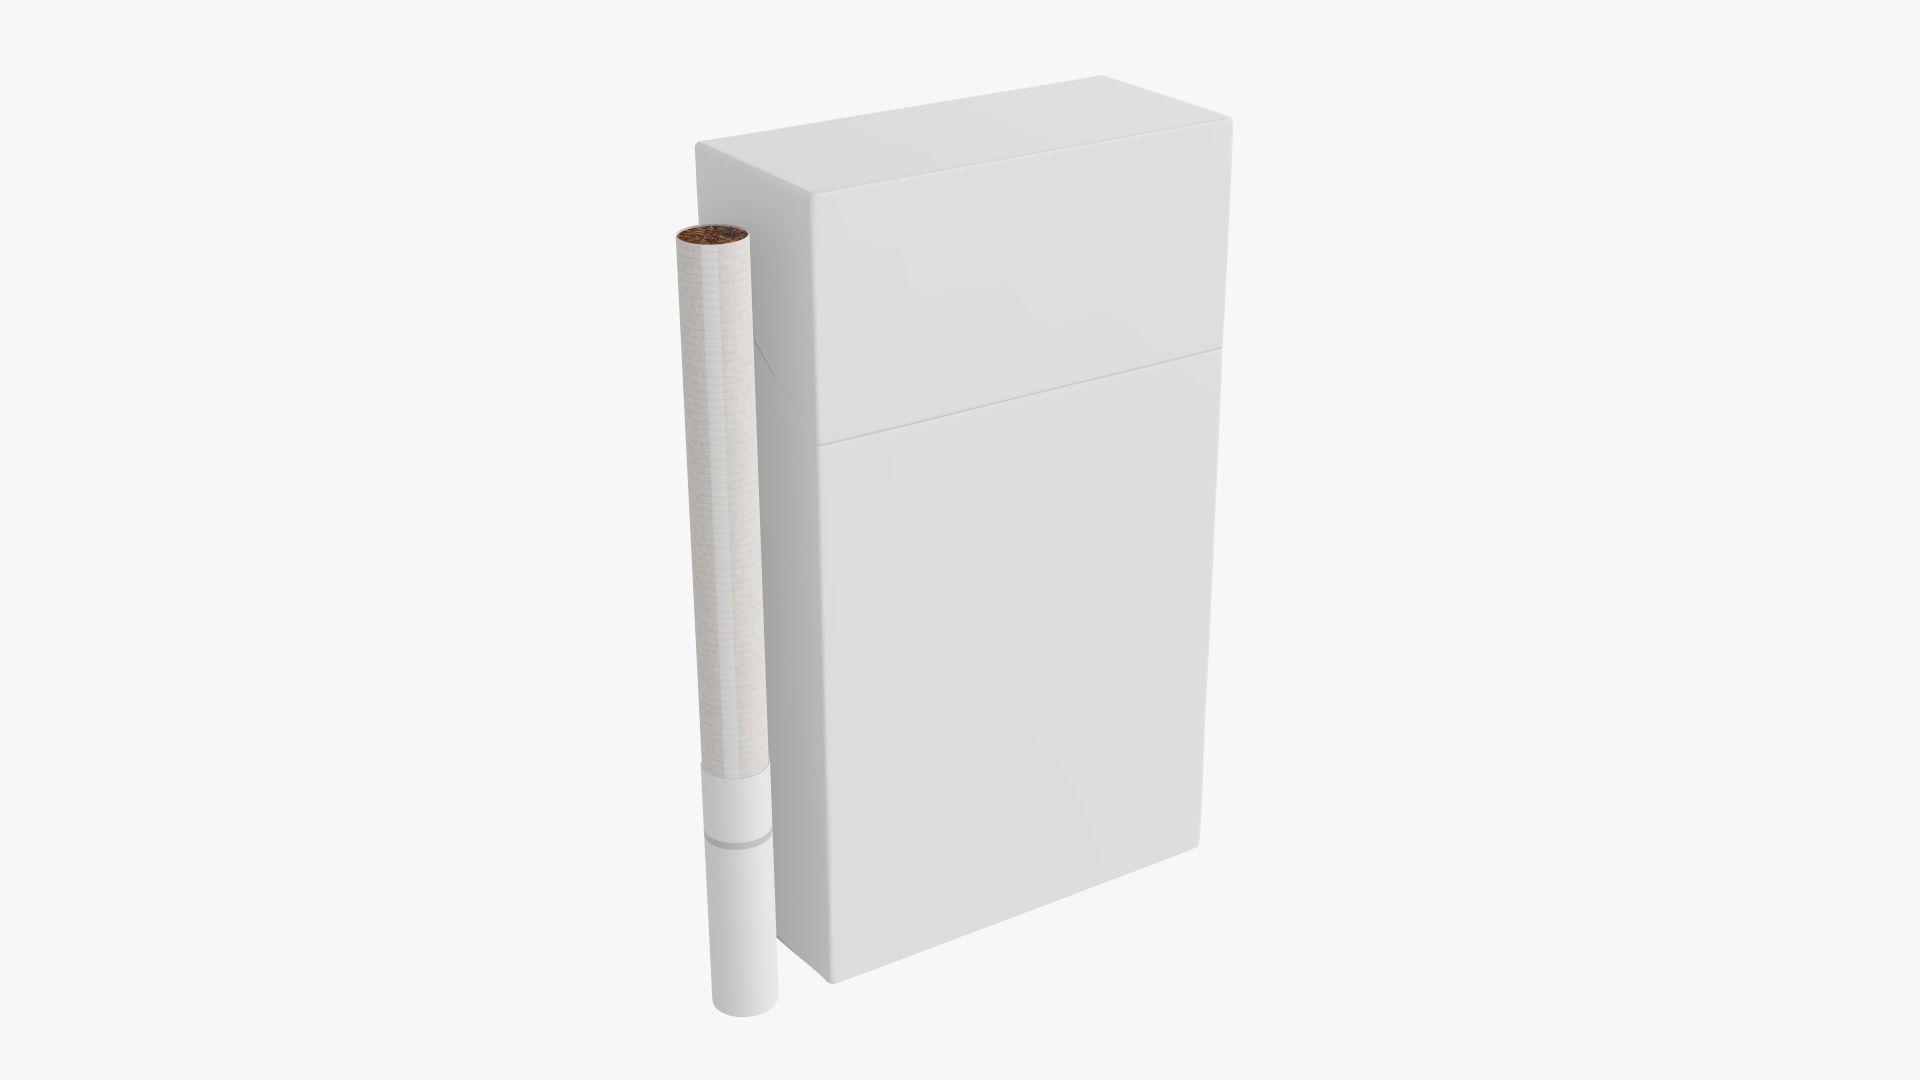 Cigarettes slim pack unopened